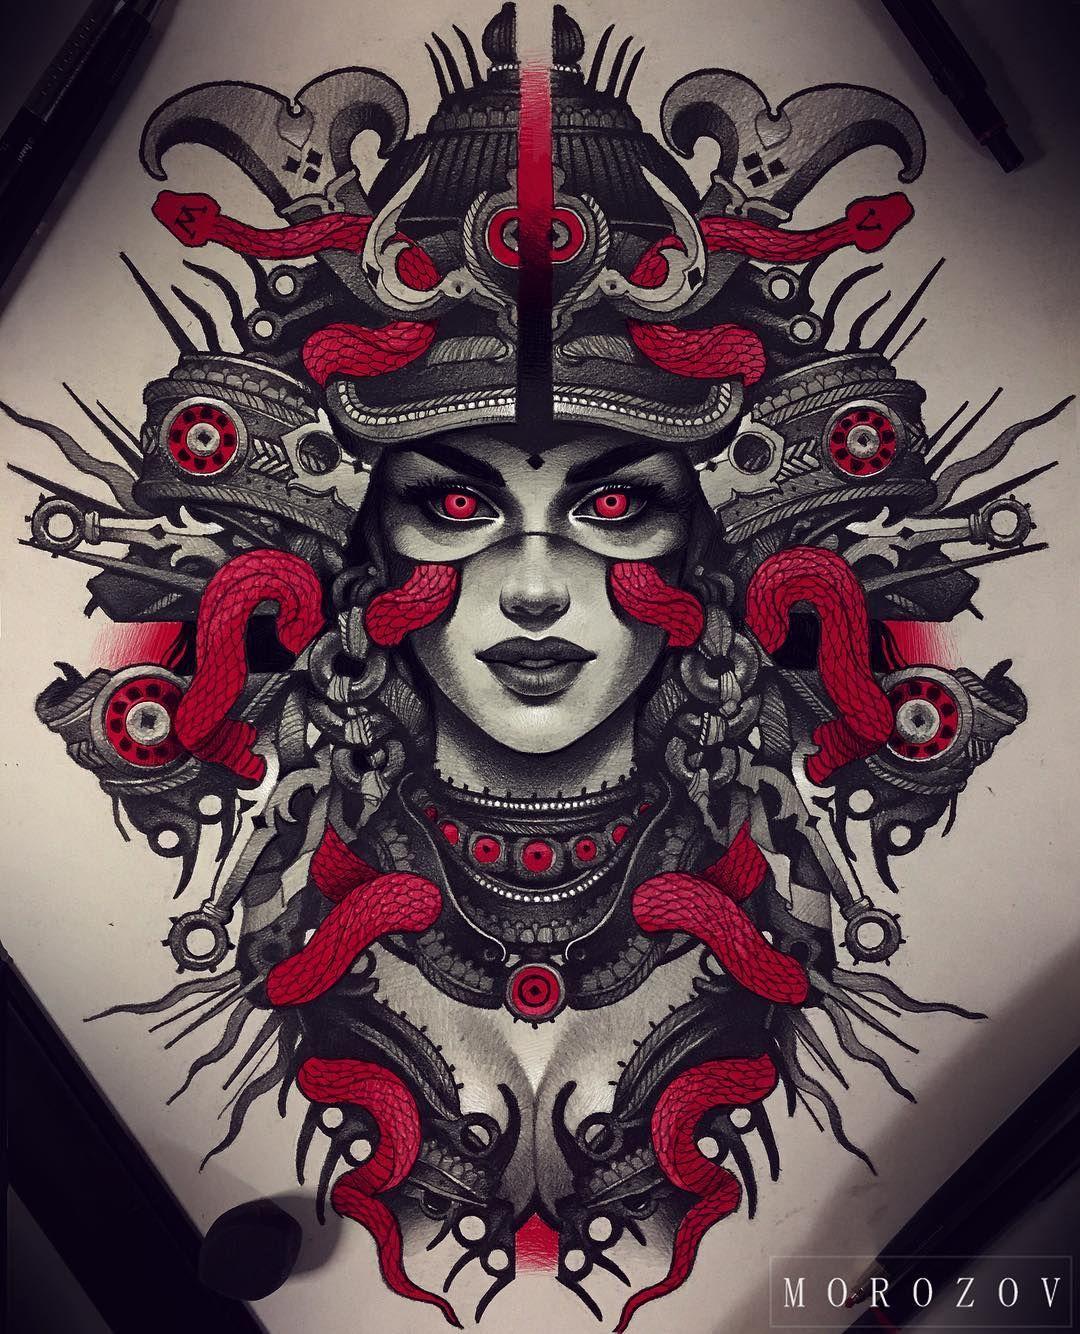 "10.6k Likes, 109 Comments - Vitaly Morozov (@mvtattoo) on Instagram: ""Available for tattoo tattoomv@gmail.com/эскиз свободен tattoomv@gmail.com…"""